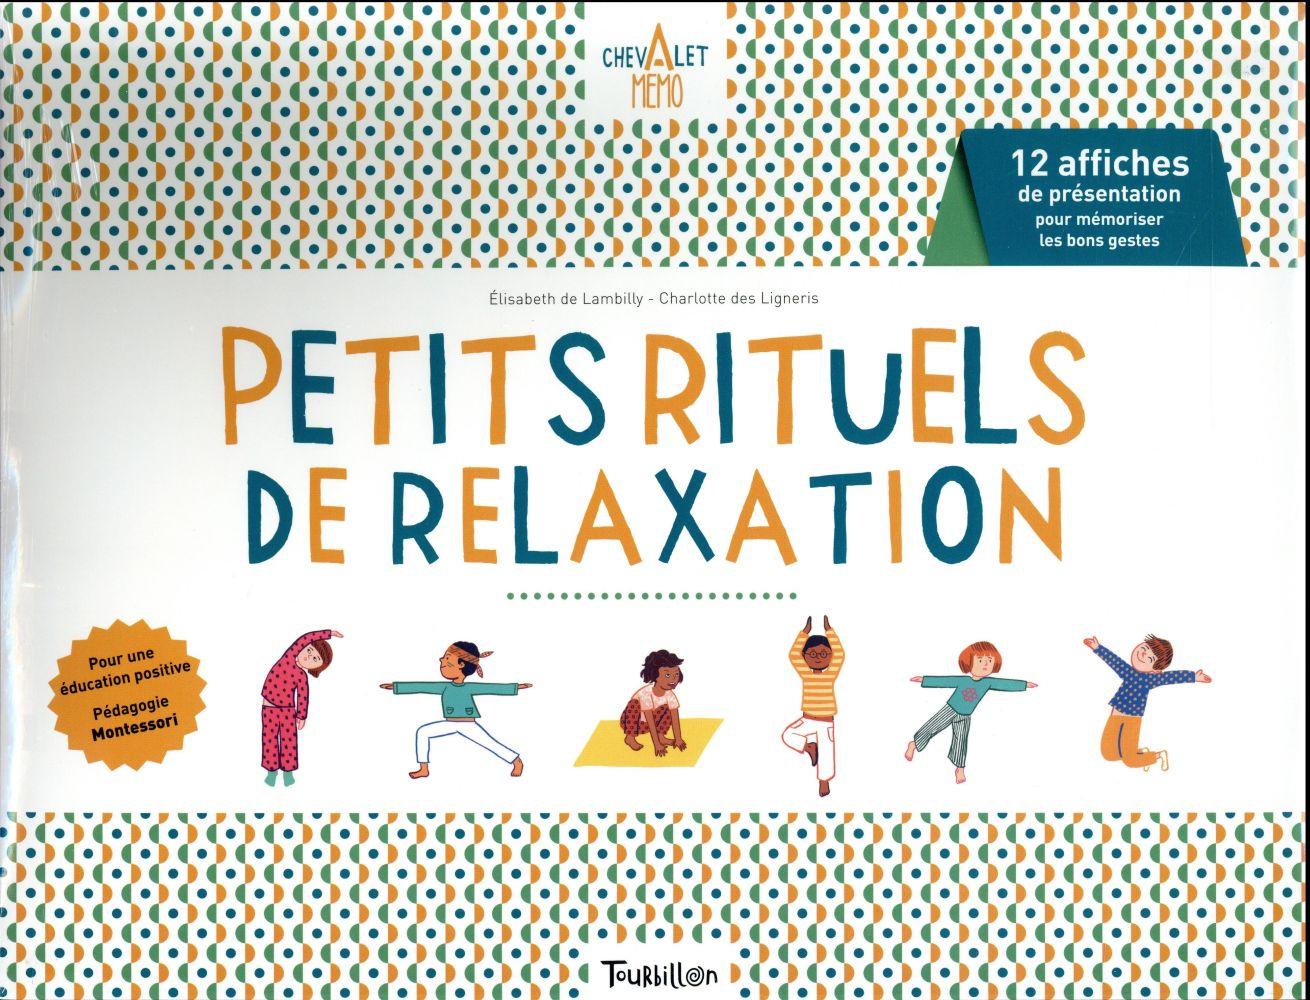 CHEVALET MEMO - PETITS RITUELS DE RELAXATION